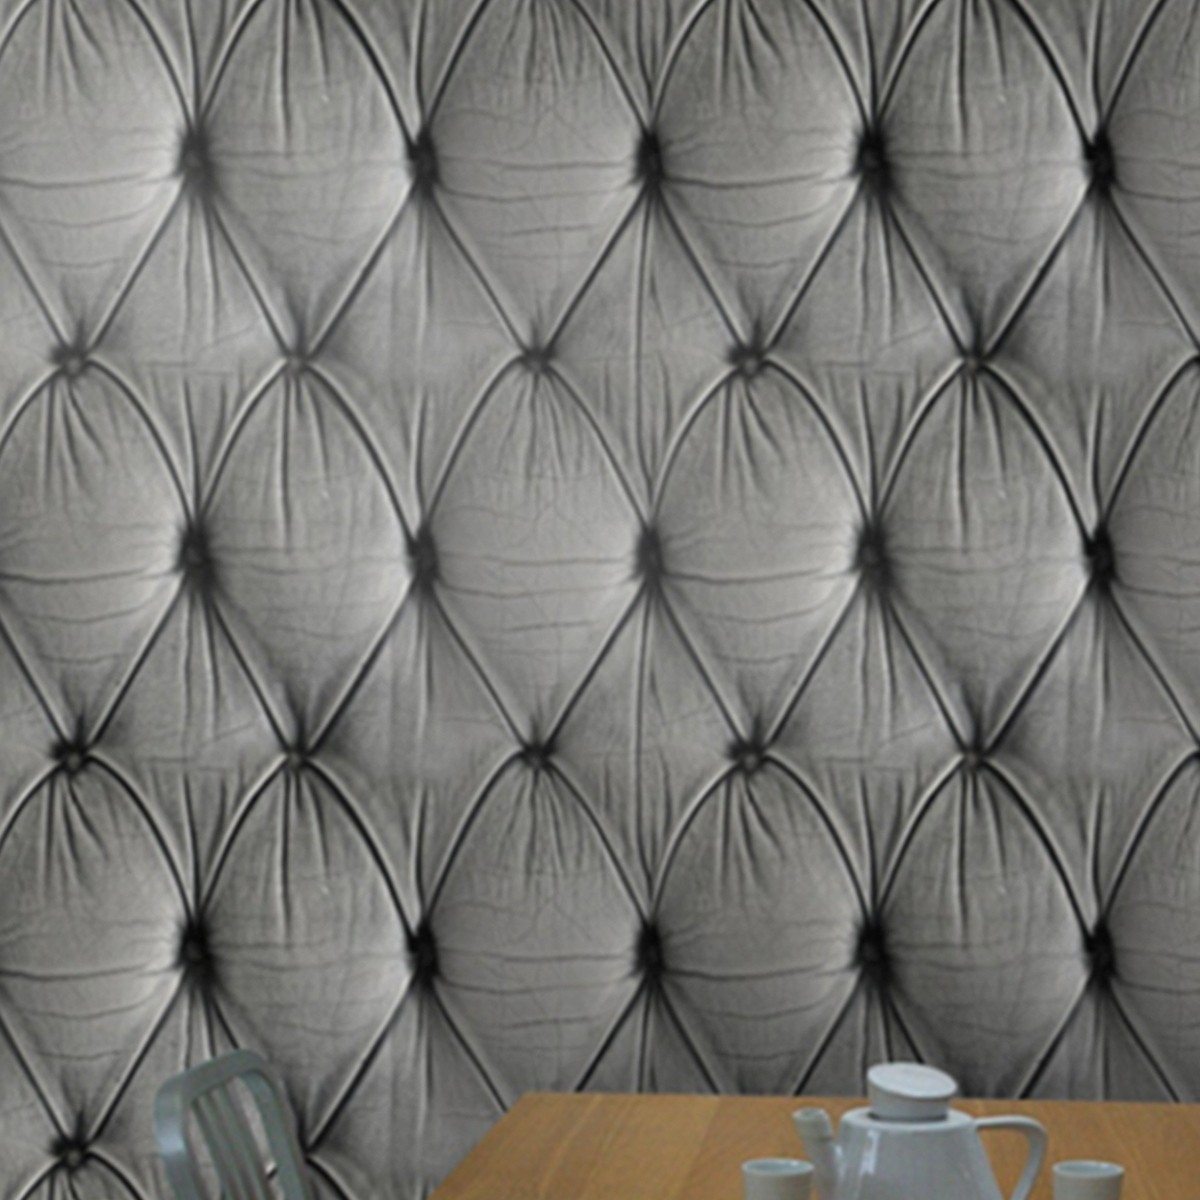 tapete chesterfield button back grey die tapetenagentur. Black Bedroom Furniture Sets. Home Design Ideas